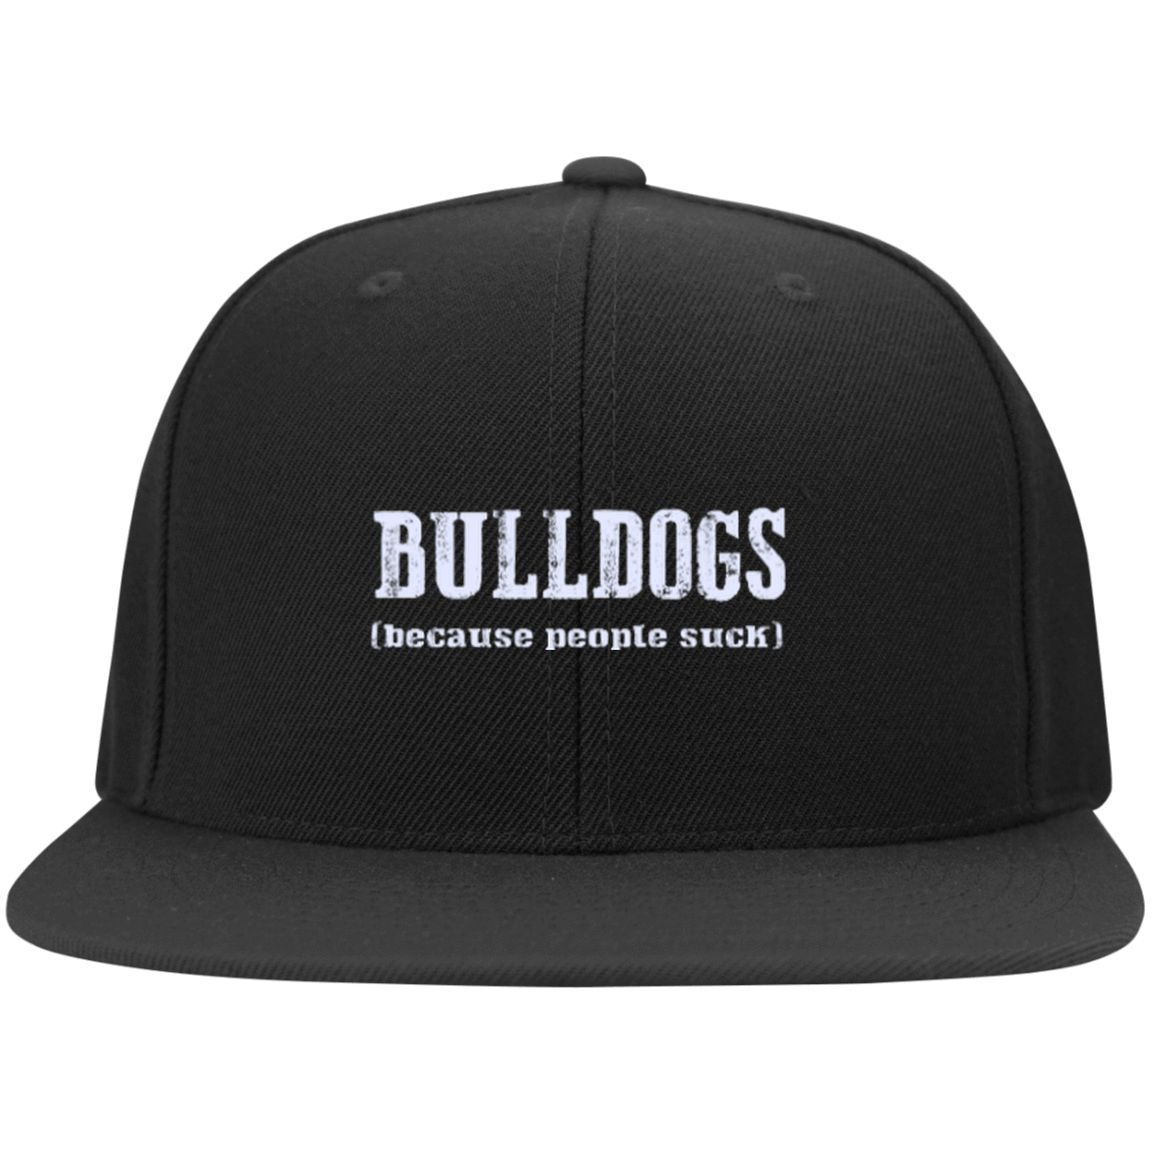 Bulldog (because people suck)